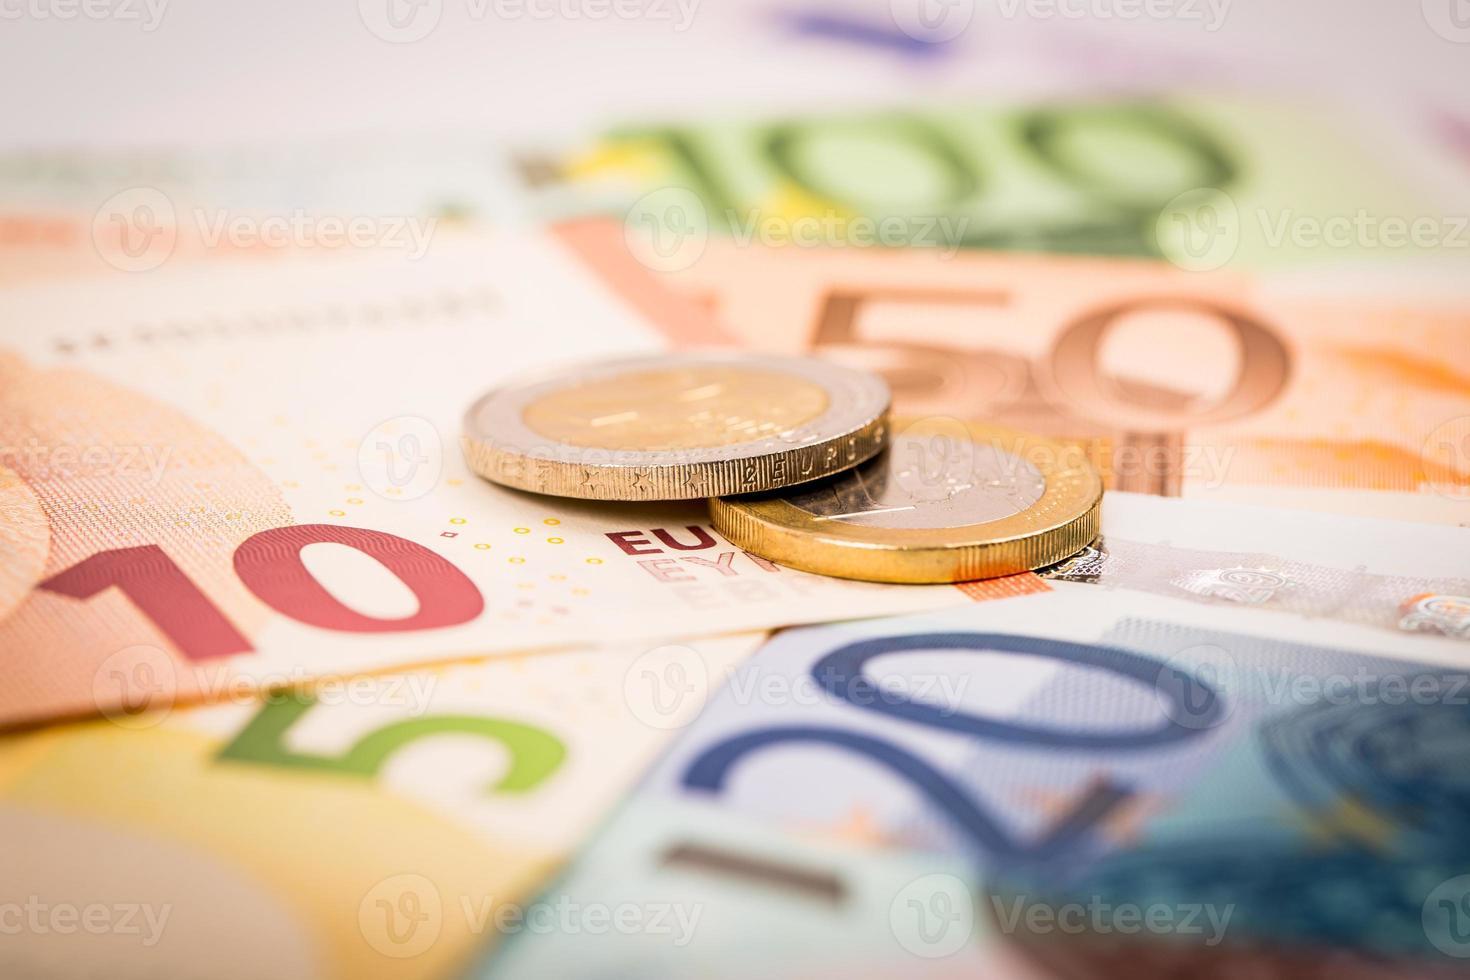 Closeup of banknotes and coins photo